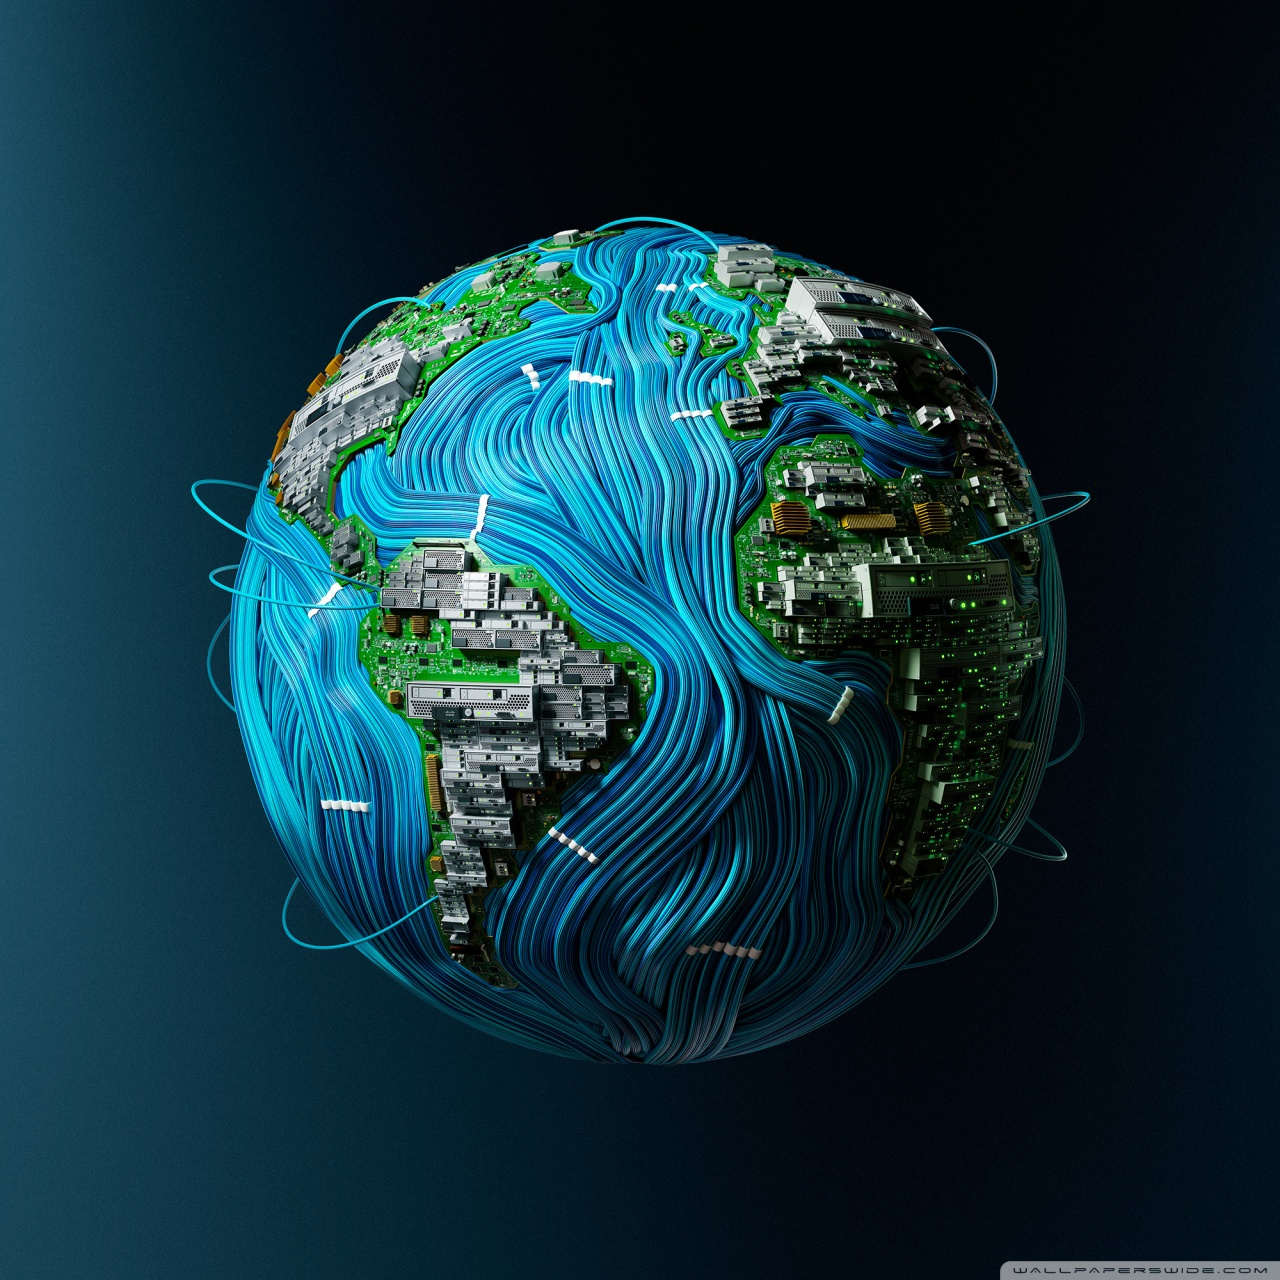 High Tech Earth Ultra HD Desktop Background Wallpaper for 4K UHD 1280x1280